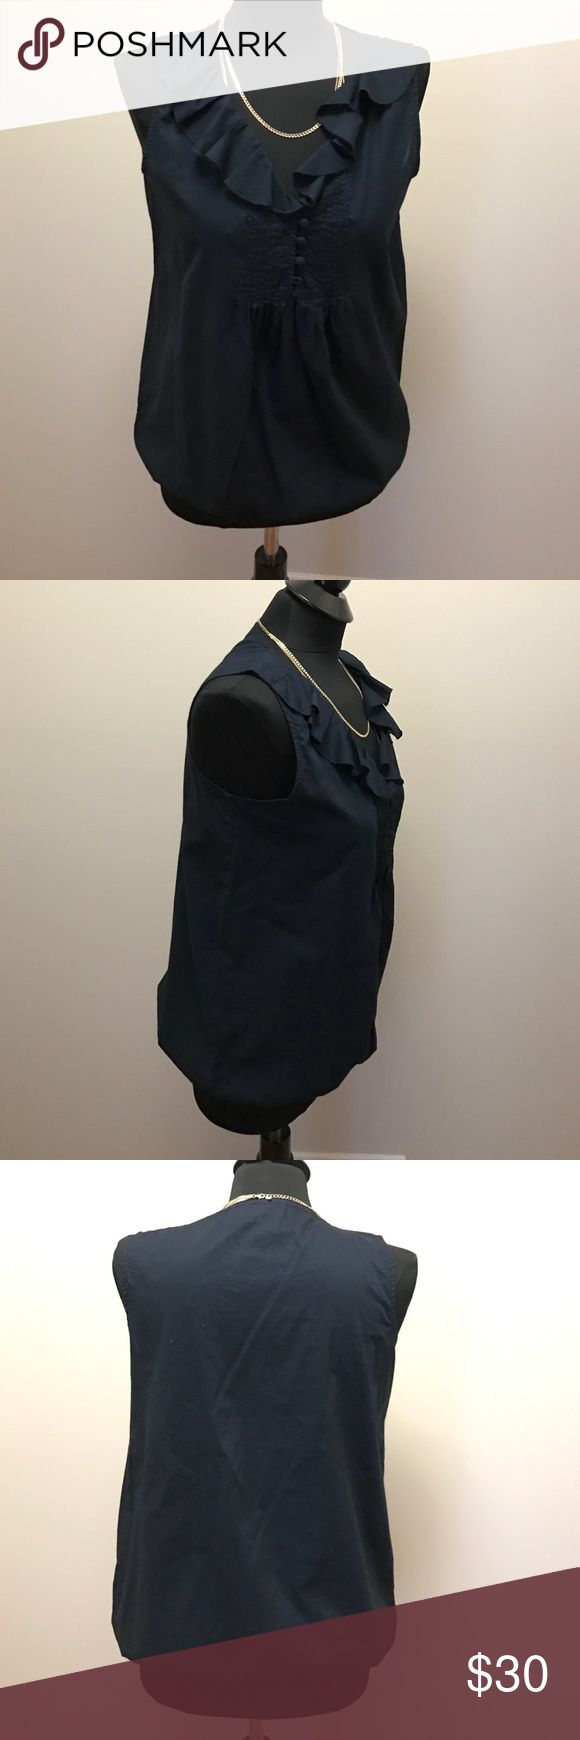 Ann Taylor LOFT Sleeveless Blouse Navy Blue Ann Taylor LOFT Sleeveless Blouse with ruffle detail and elastic waist. 100% Cotton. LOFT Tops Blouses